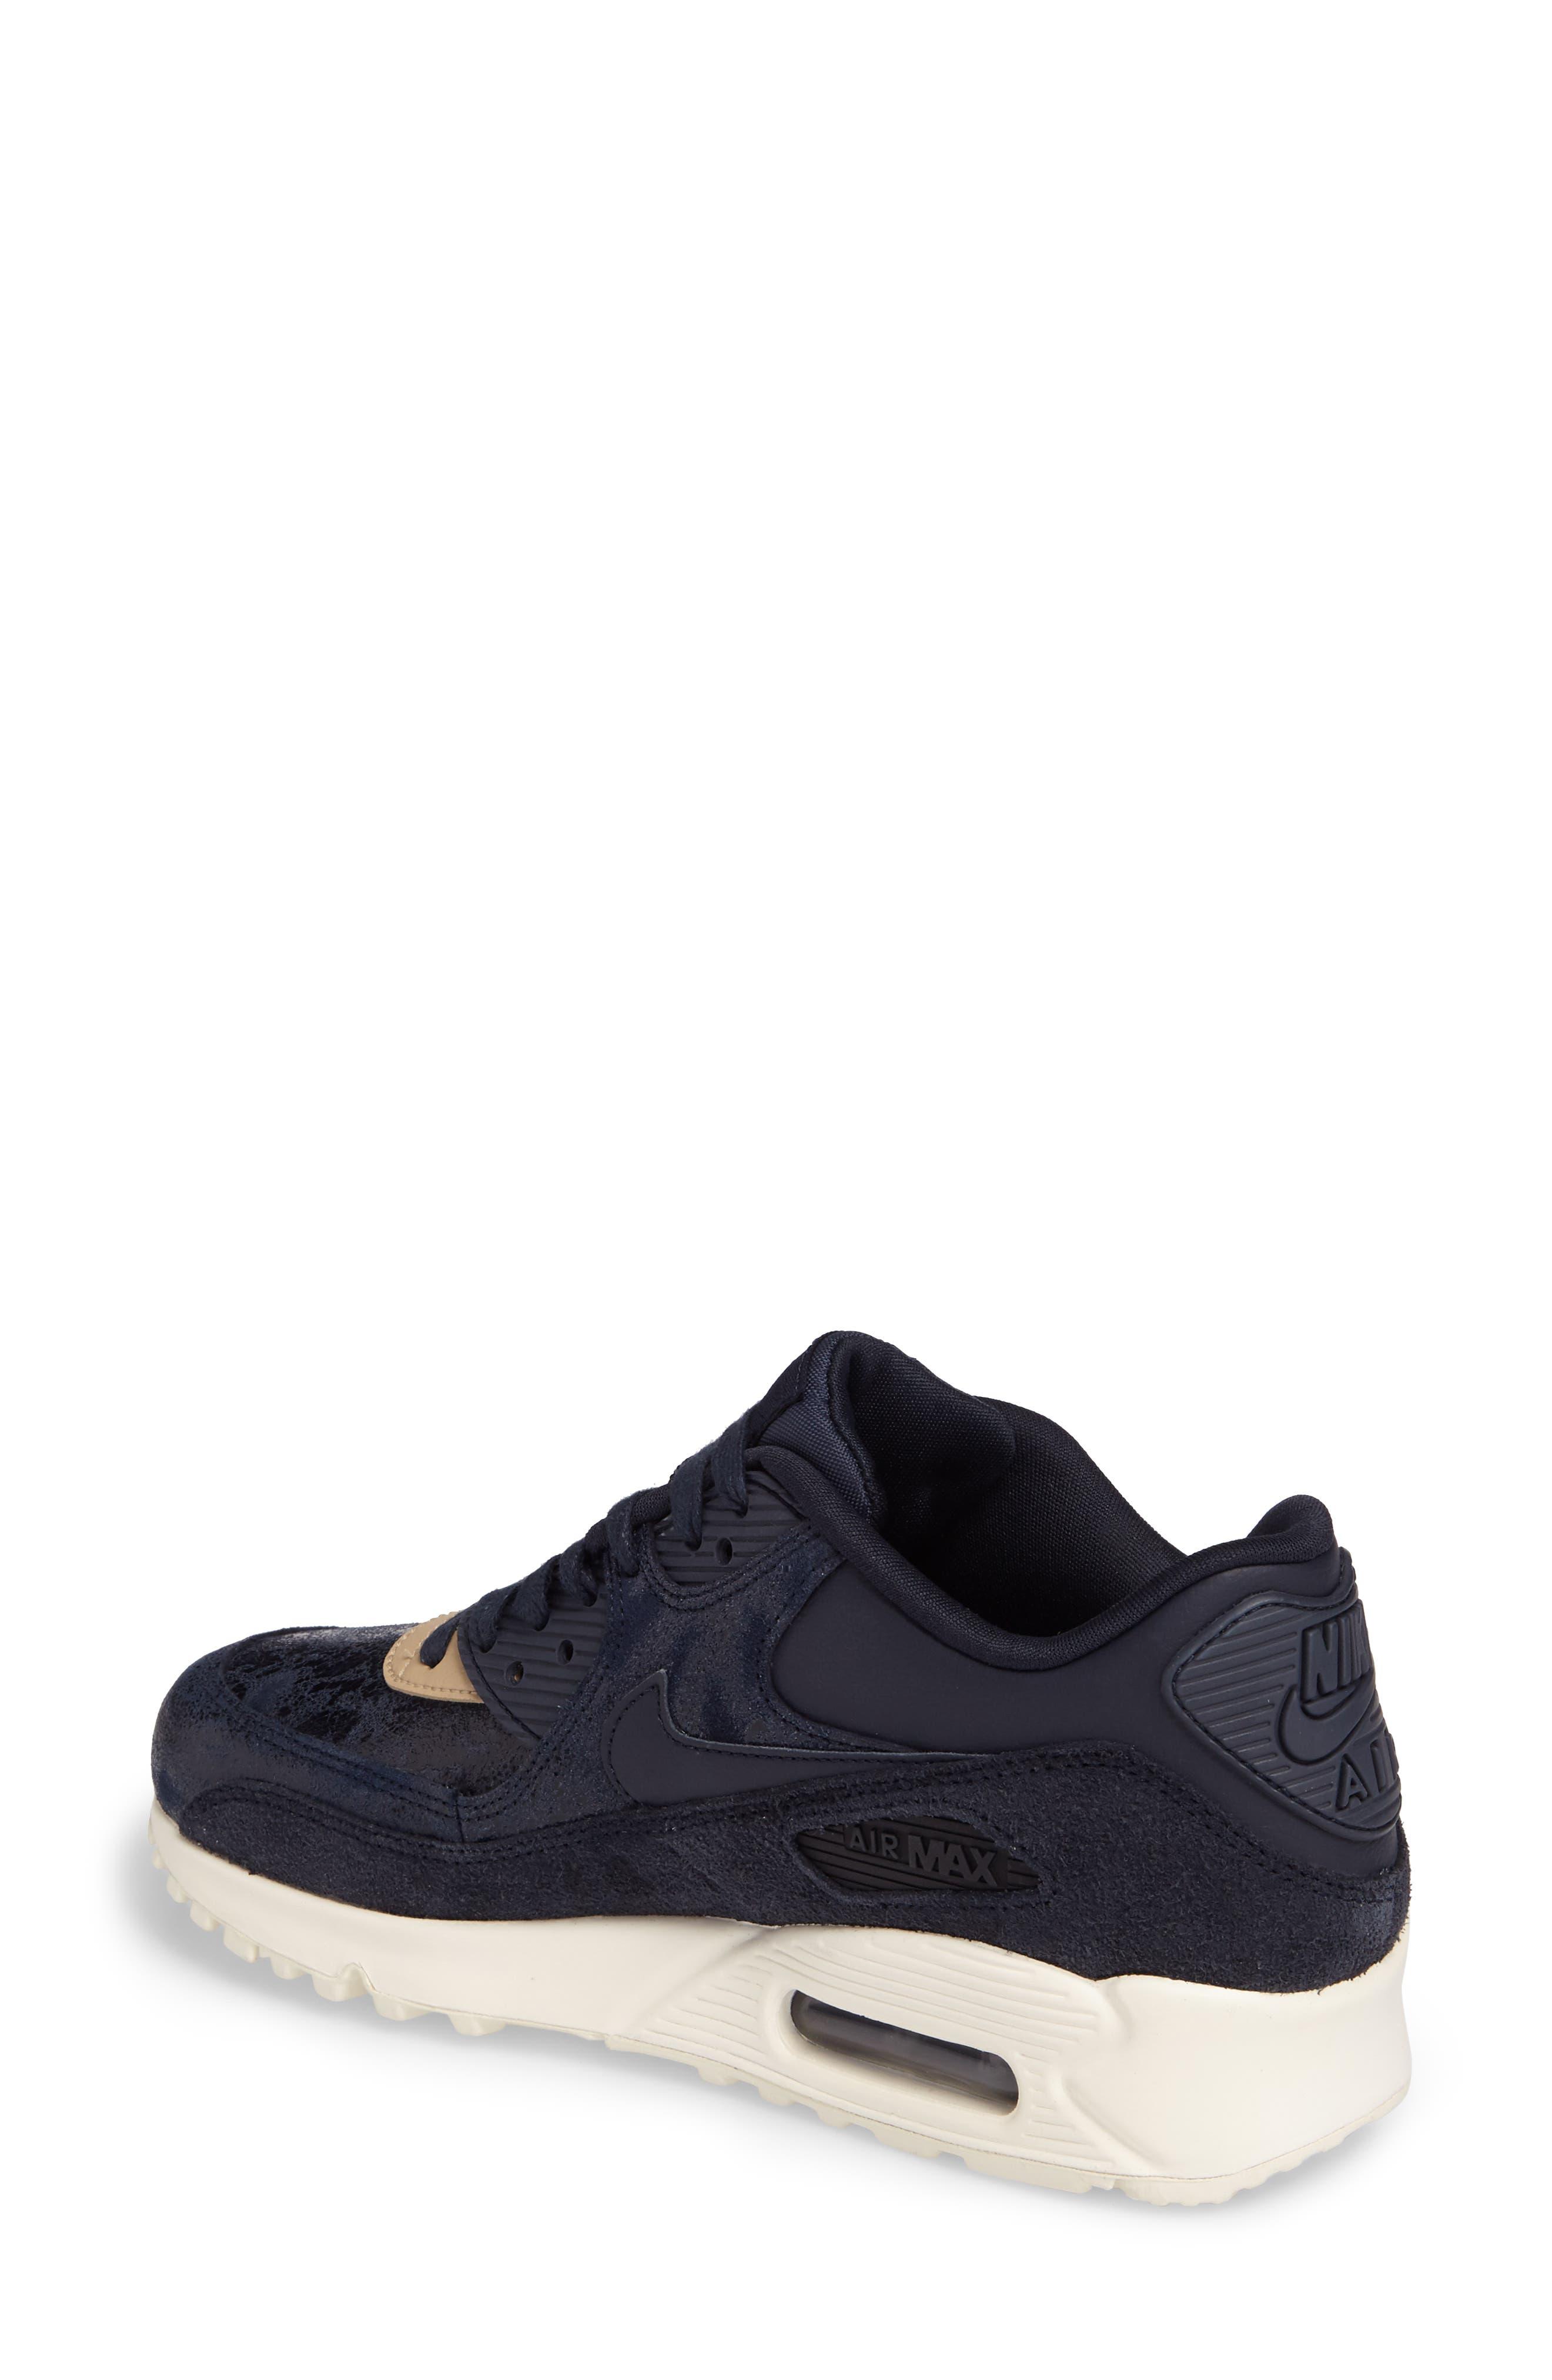 Air Max 90 Premium Sneaker,                             Alternate thumbnail 2, color,                             Dark Obsidian/ Sail/ Mushroom